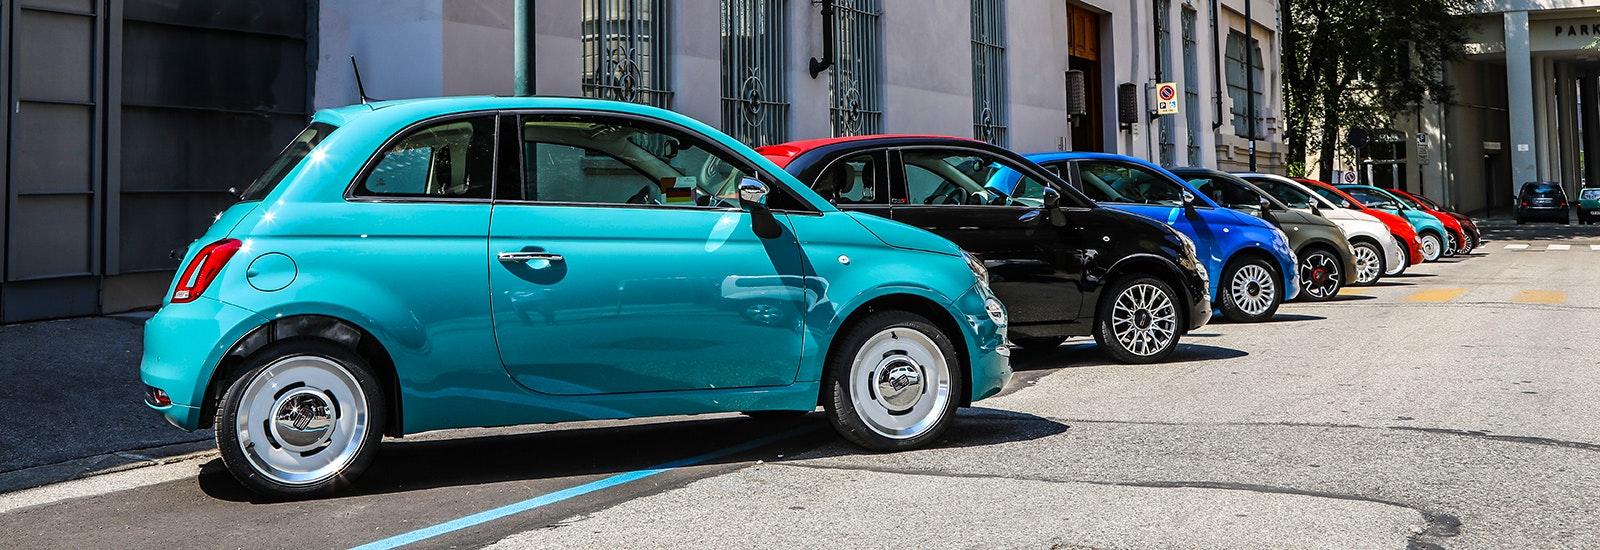 2017 Fiat Scrappage Scheme What Cars Qualify Carwow